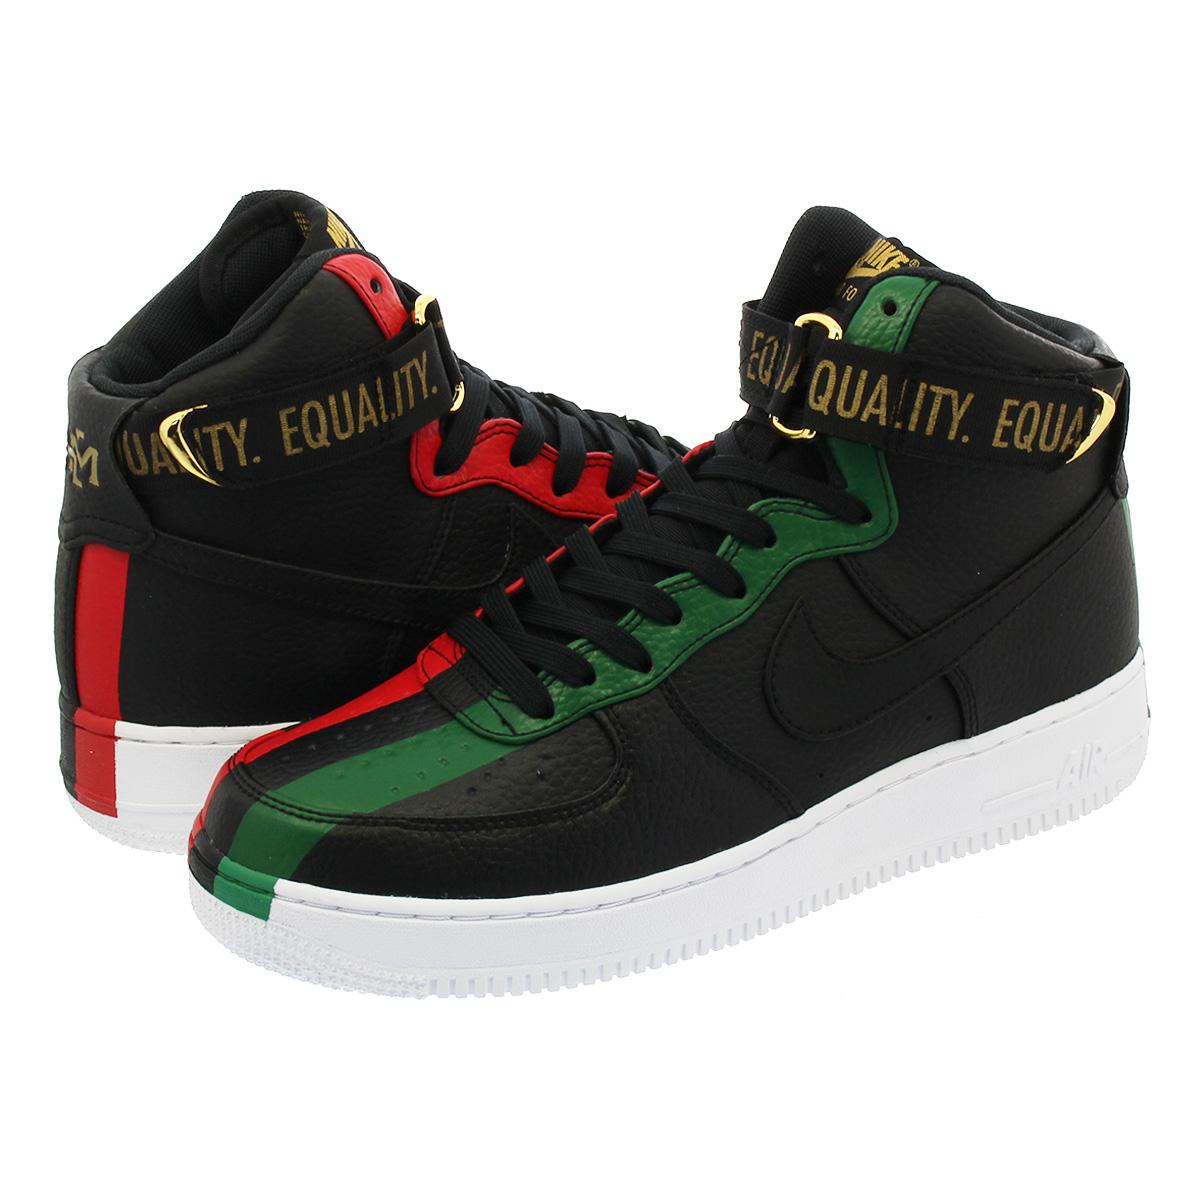 981e9a57dc4800 NIKE AIR FORCE 1 HIGH BHM 2018 Nike air force 1 high BHM 2018 BLACK UNIVERSITY  RED PINE GREEN 836